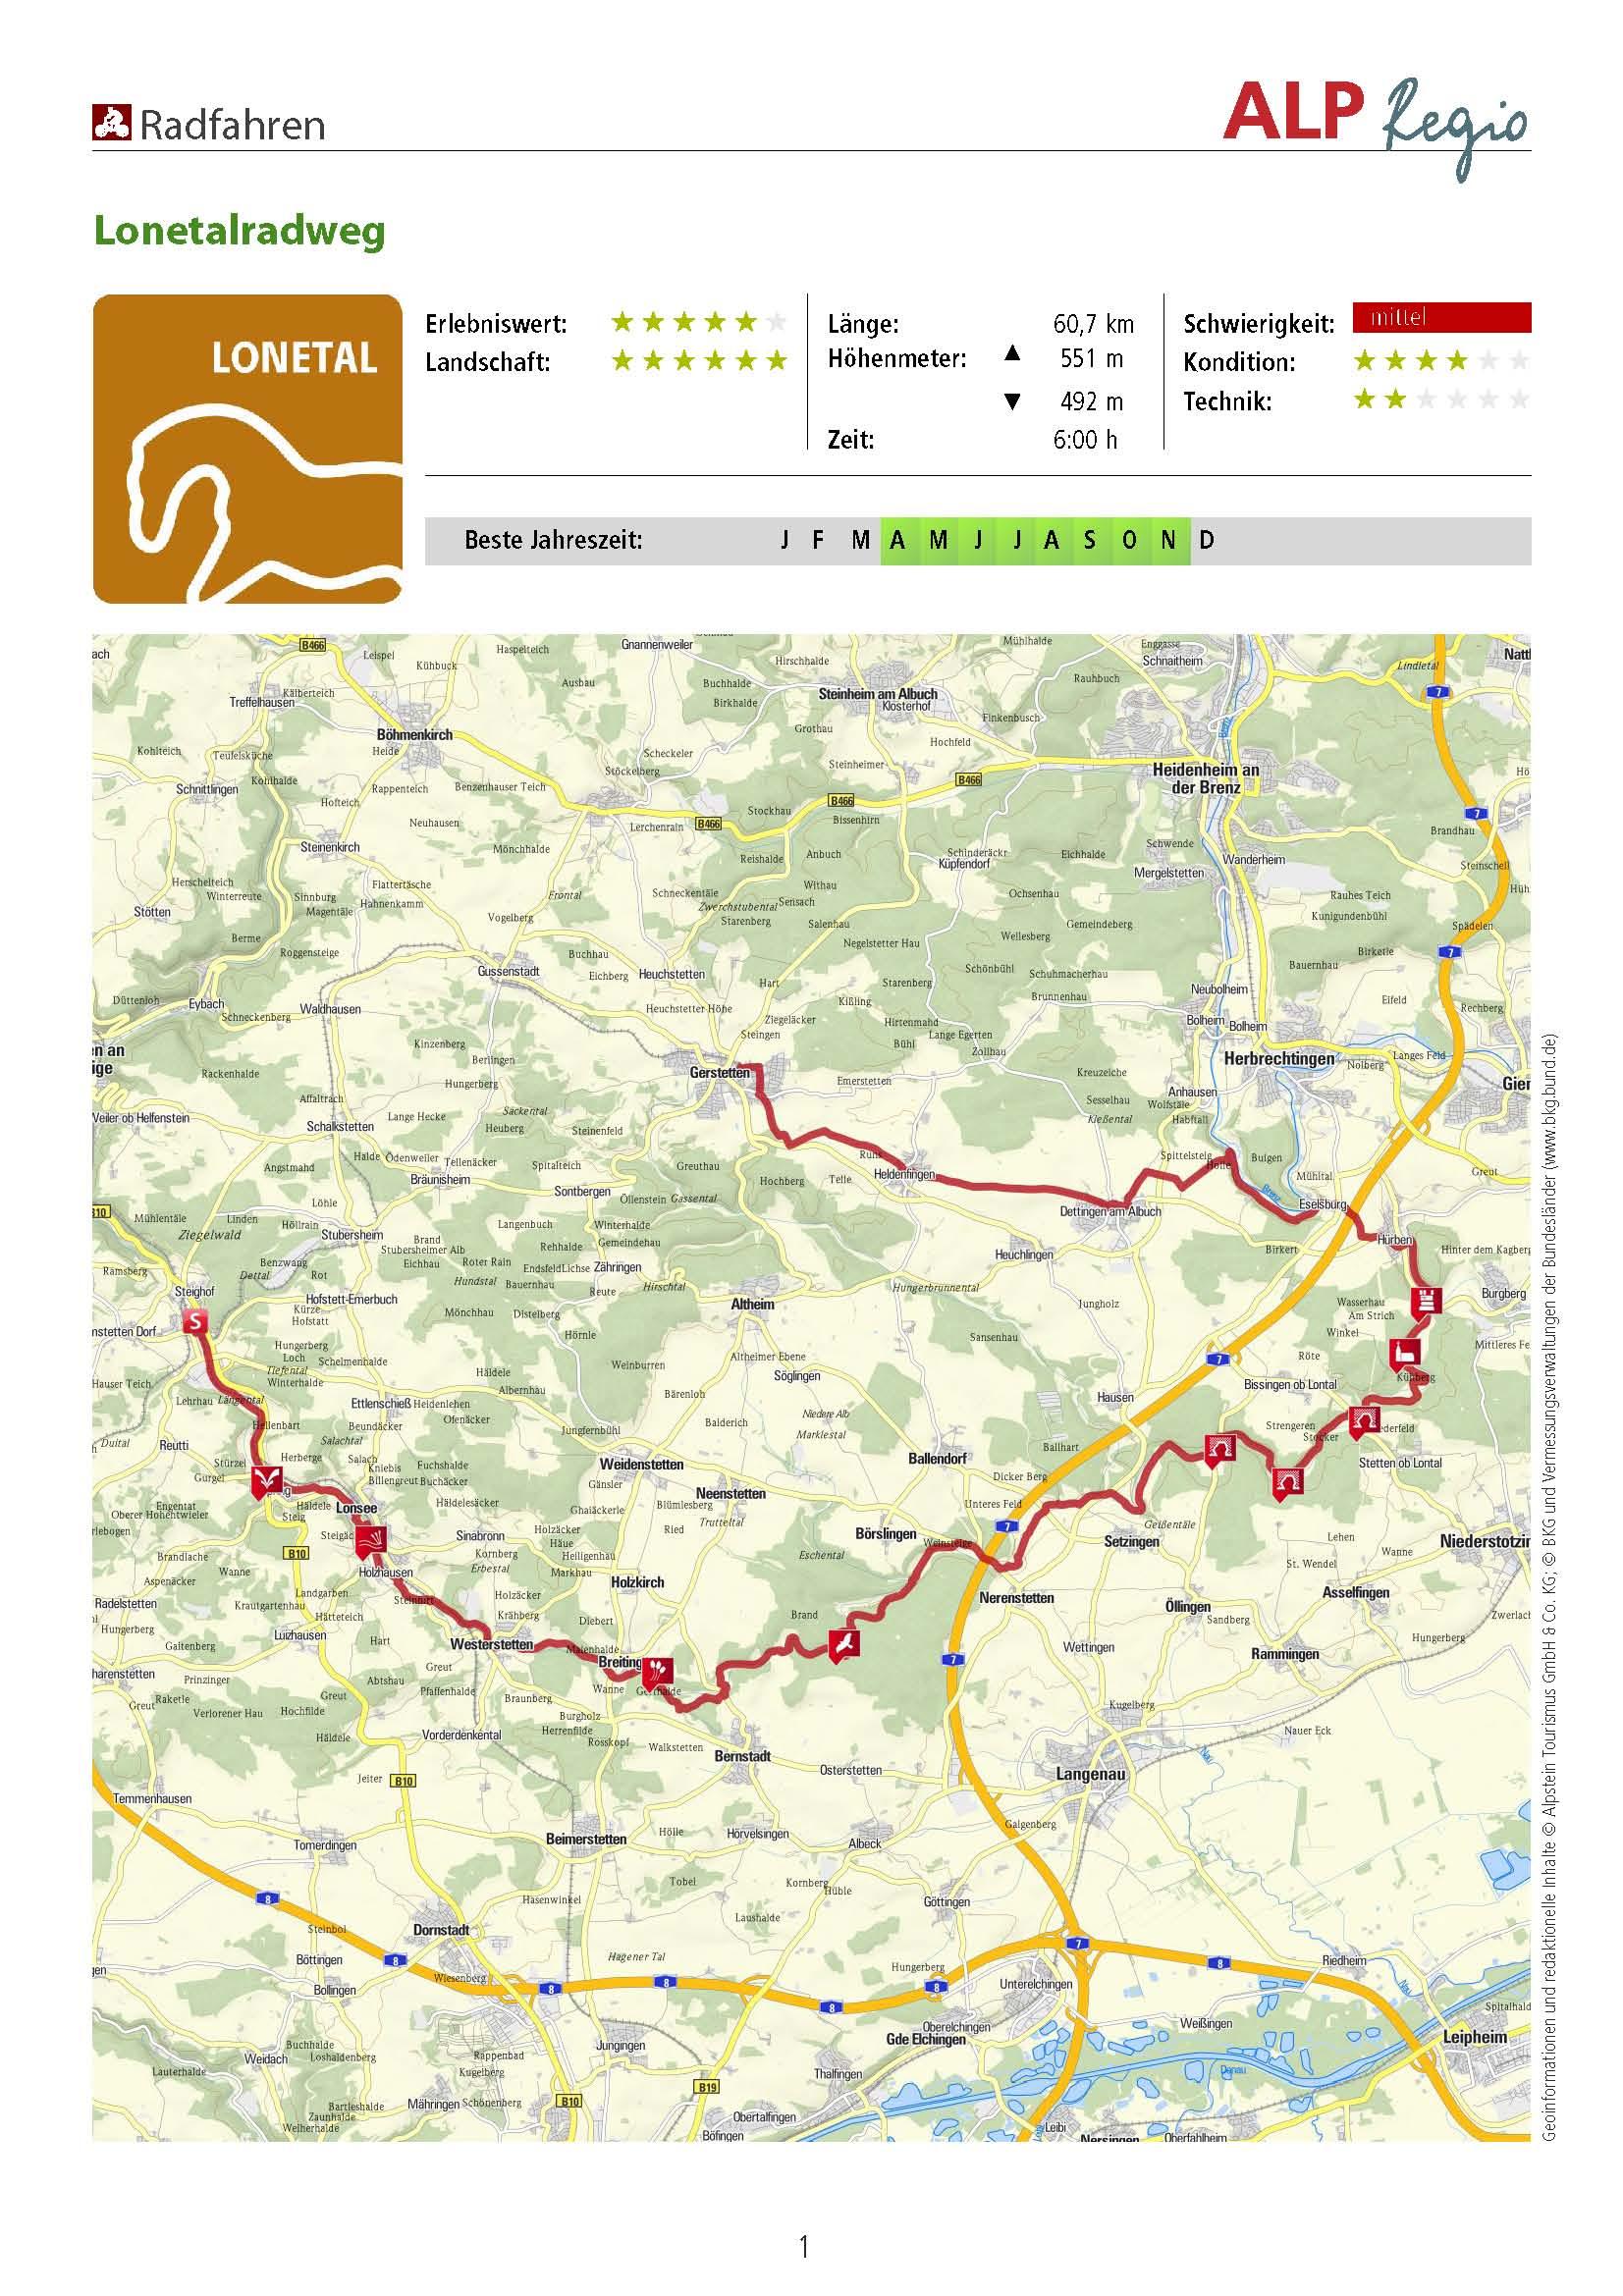 Lonetalradweg Plan